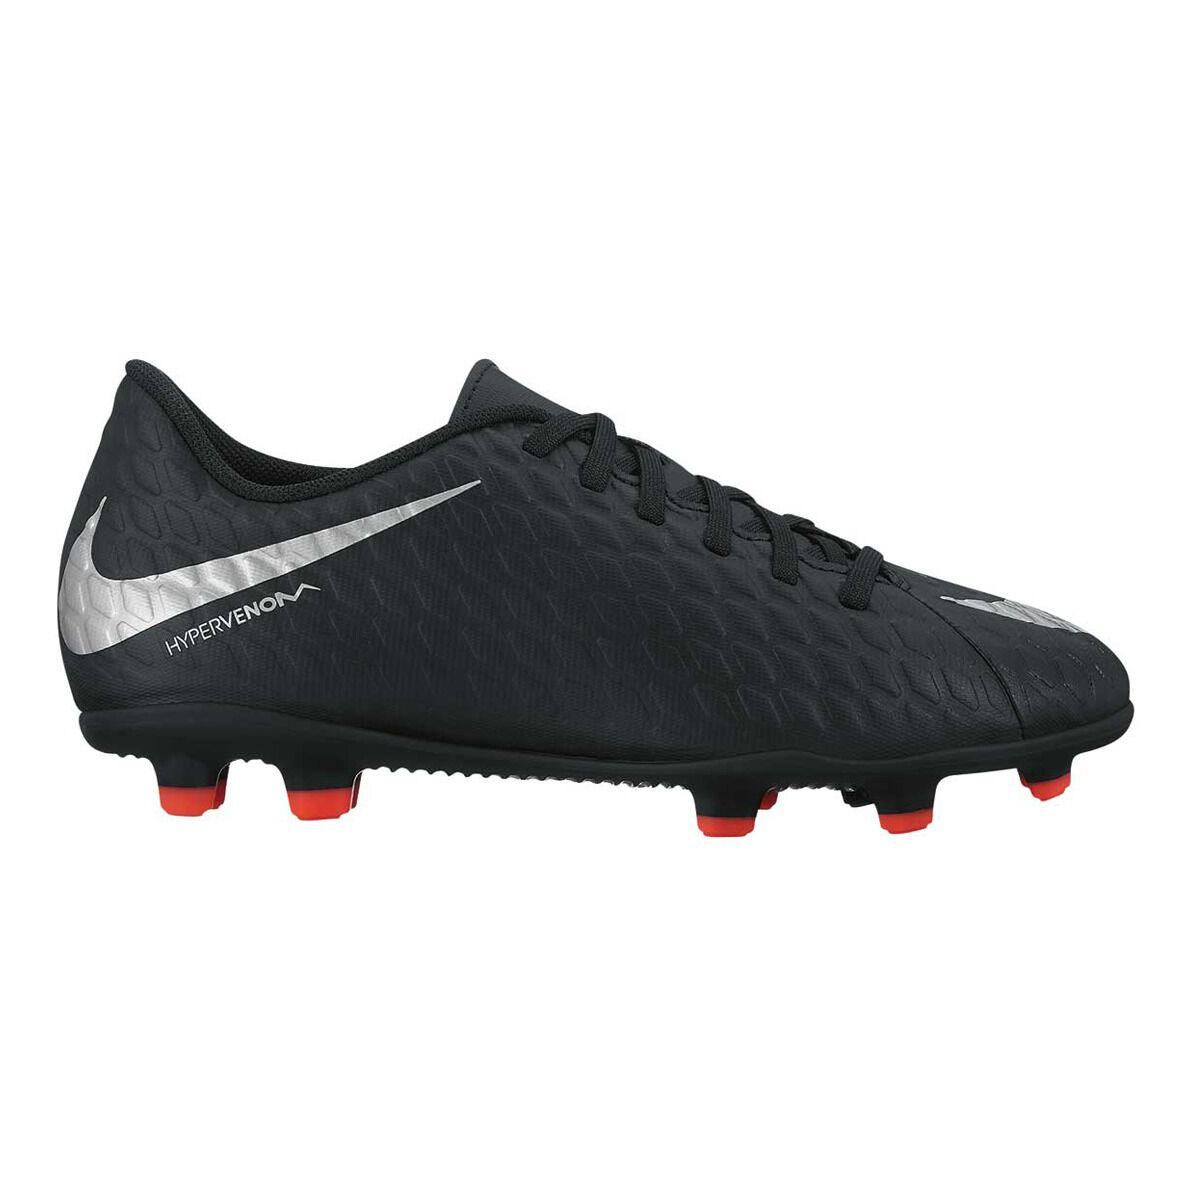 da244783ea0 ... switzerland nike hypervenom phade iii junior boys football boots black  silver us 4 junior black edd51